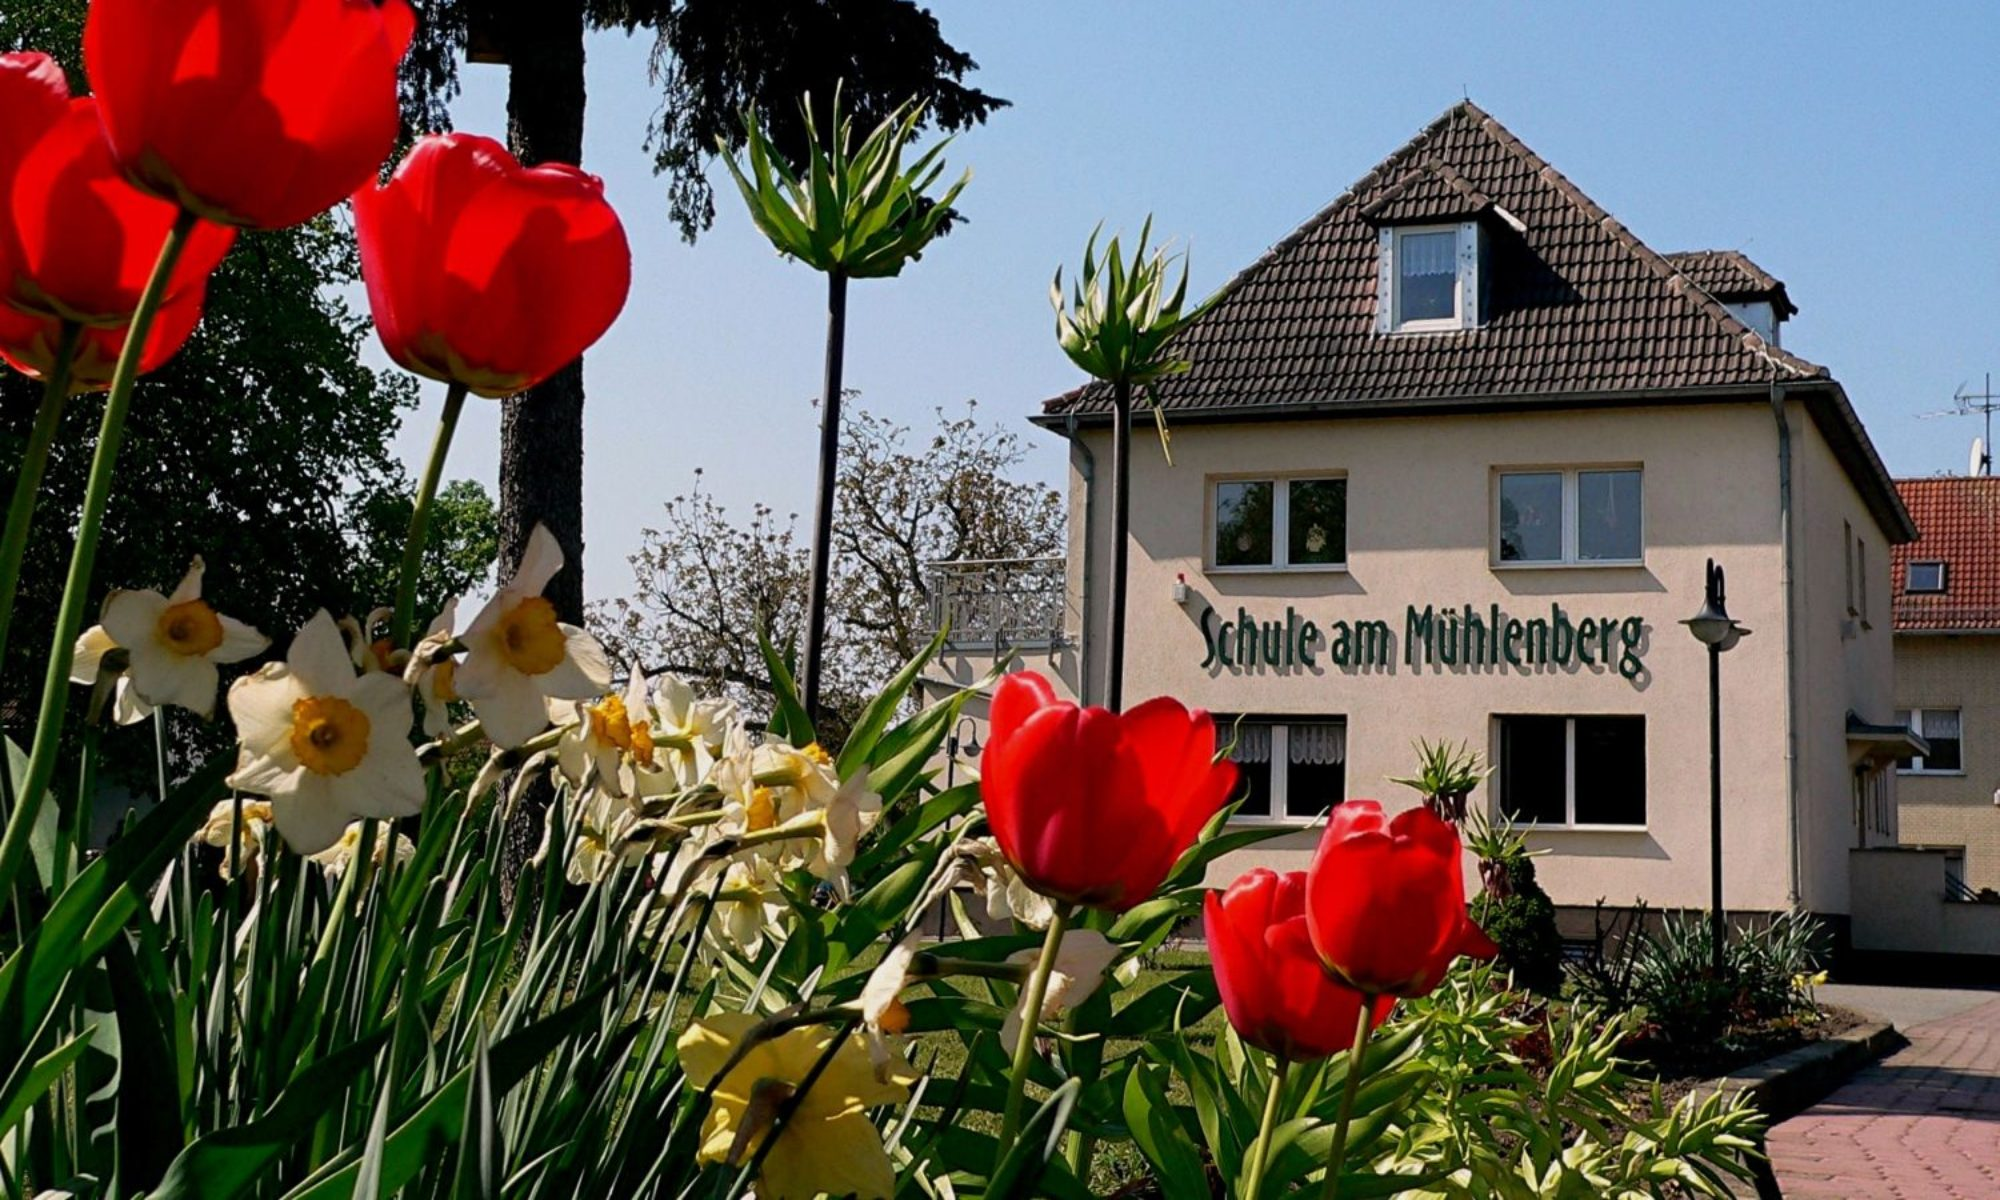 Schule am Mühlenberg